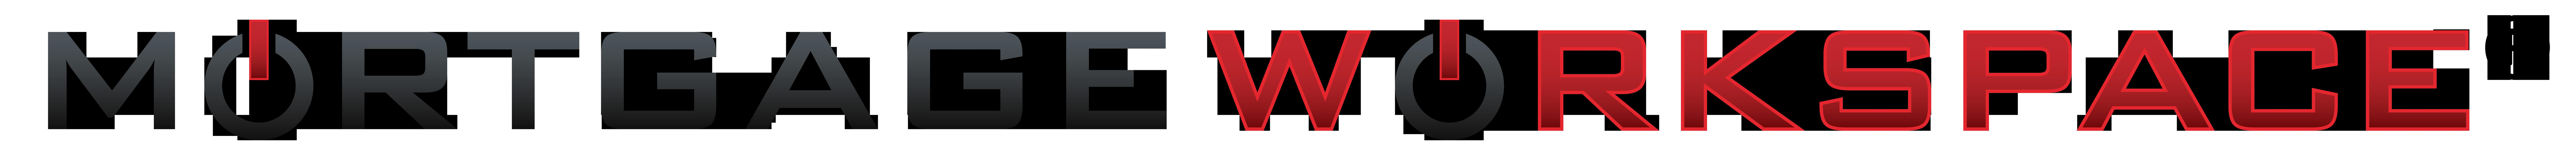 WMS_logo.png